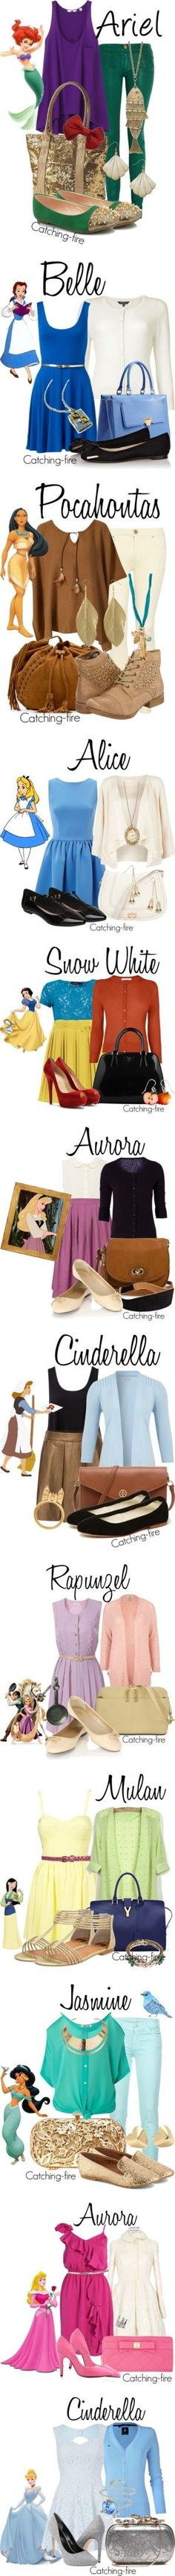 Super Kleid Prinzessin Disney Mulan Ideas- - New Ideas Disney Inspired Outfits, Disney Outfits, Disney Style, Disney Love, Disney Magic, Cute Outfits, Disney Fashion, Funny Disney, Disney Clothes